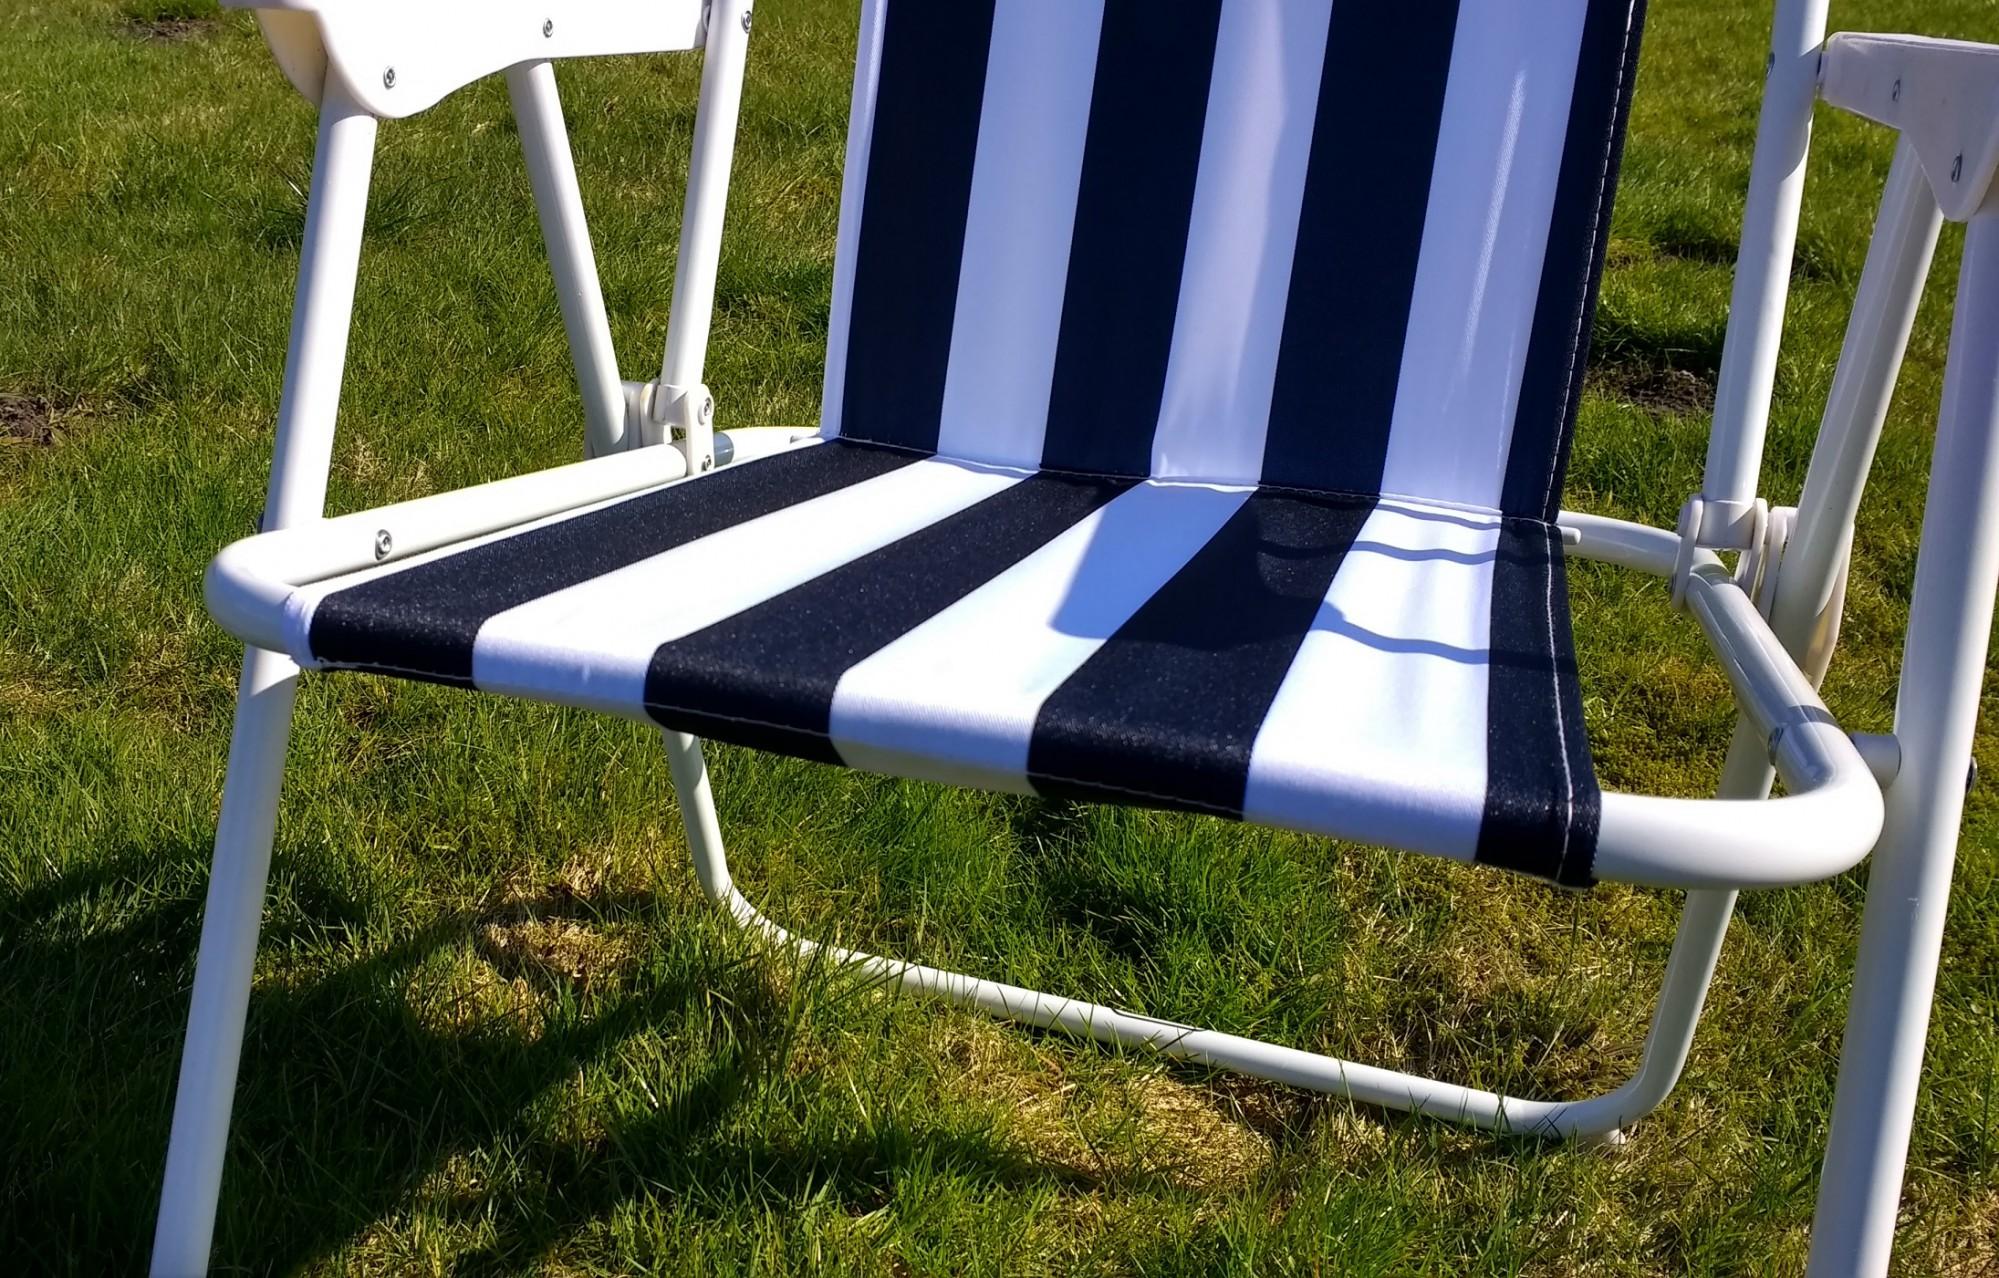 klappstuhl campingstuhl mit armlehnen outdoor freizeit campingm bel. Black Bedroom Furniture Sets. Home Design Ideas